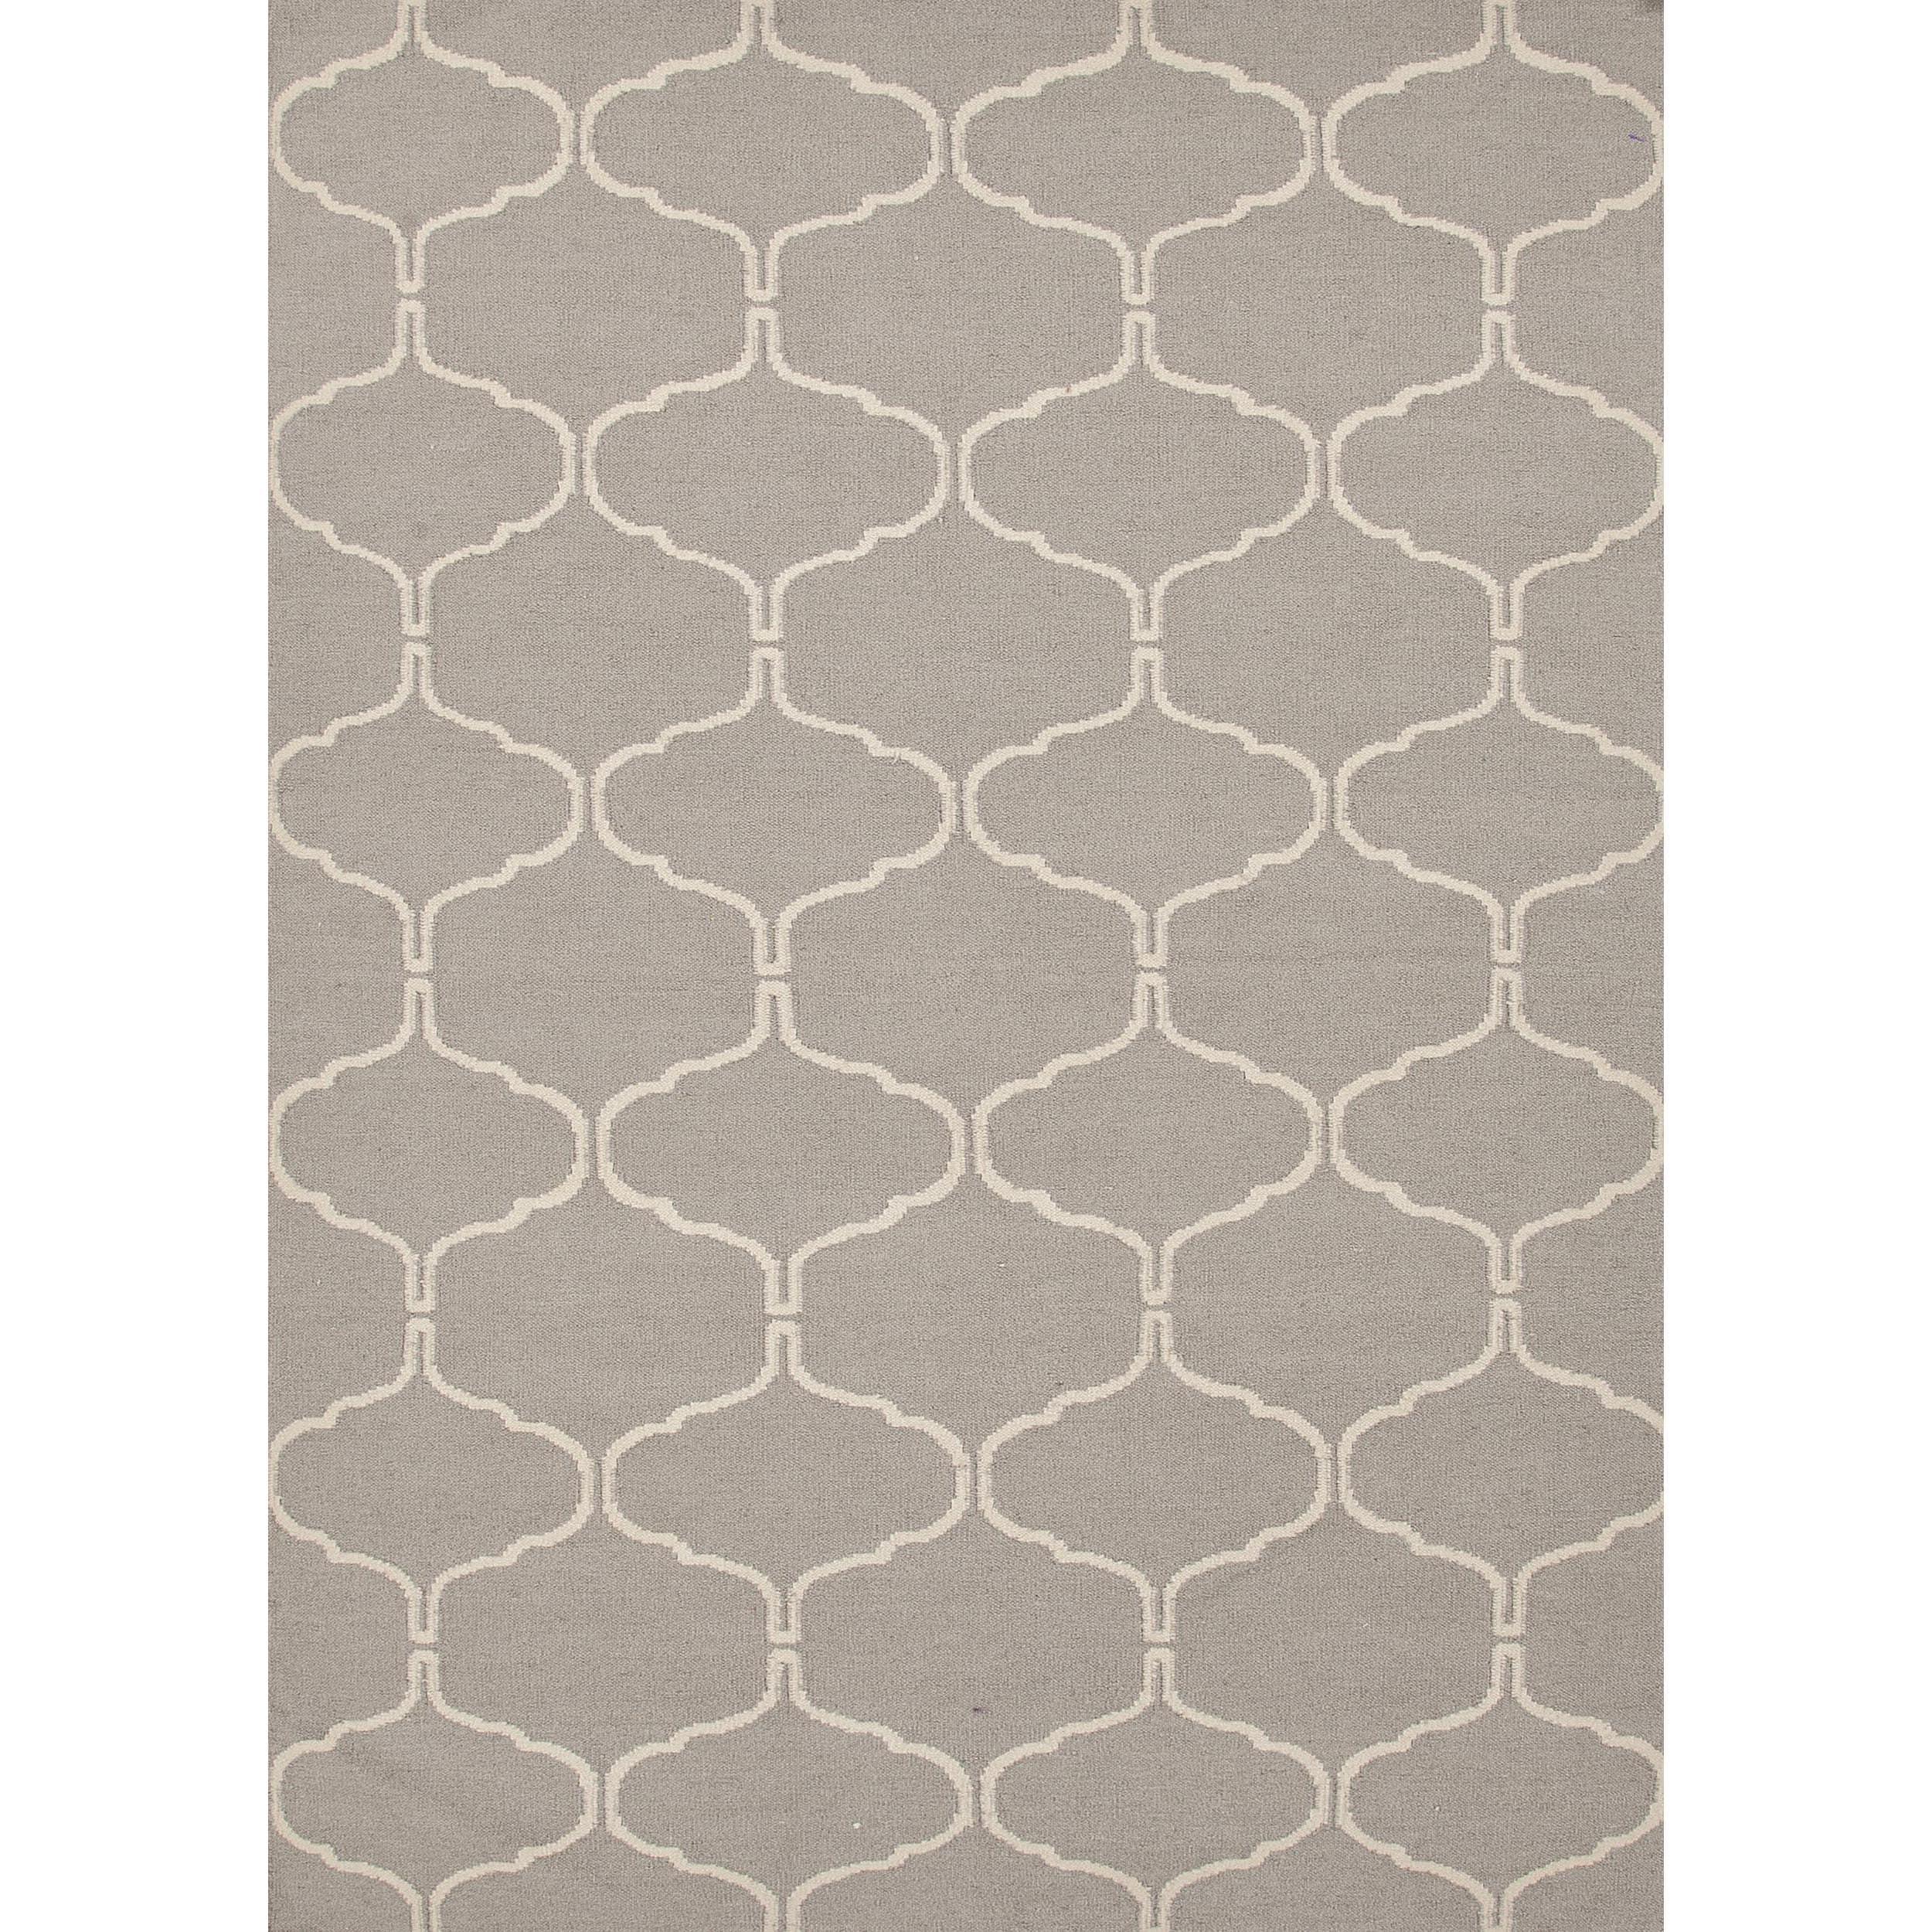 JRCPL Handmade Geometric Flat Weave Gray Wool Rug (3'6 x 5'6) at Sears.com